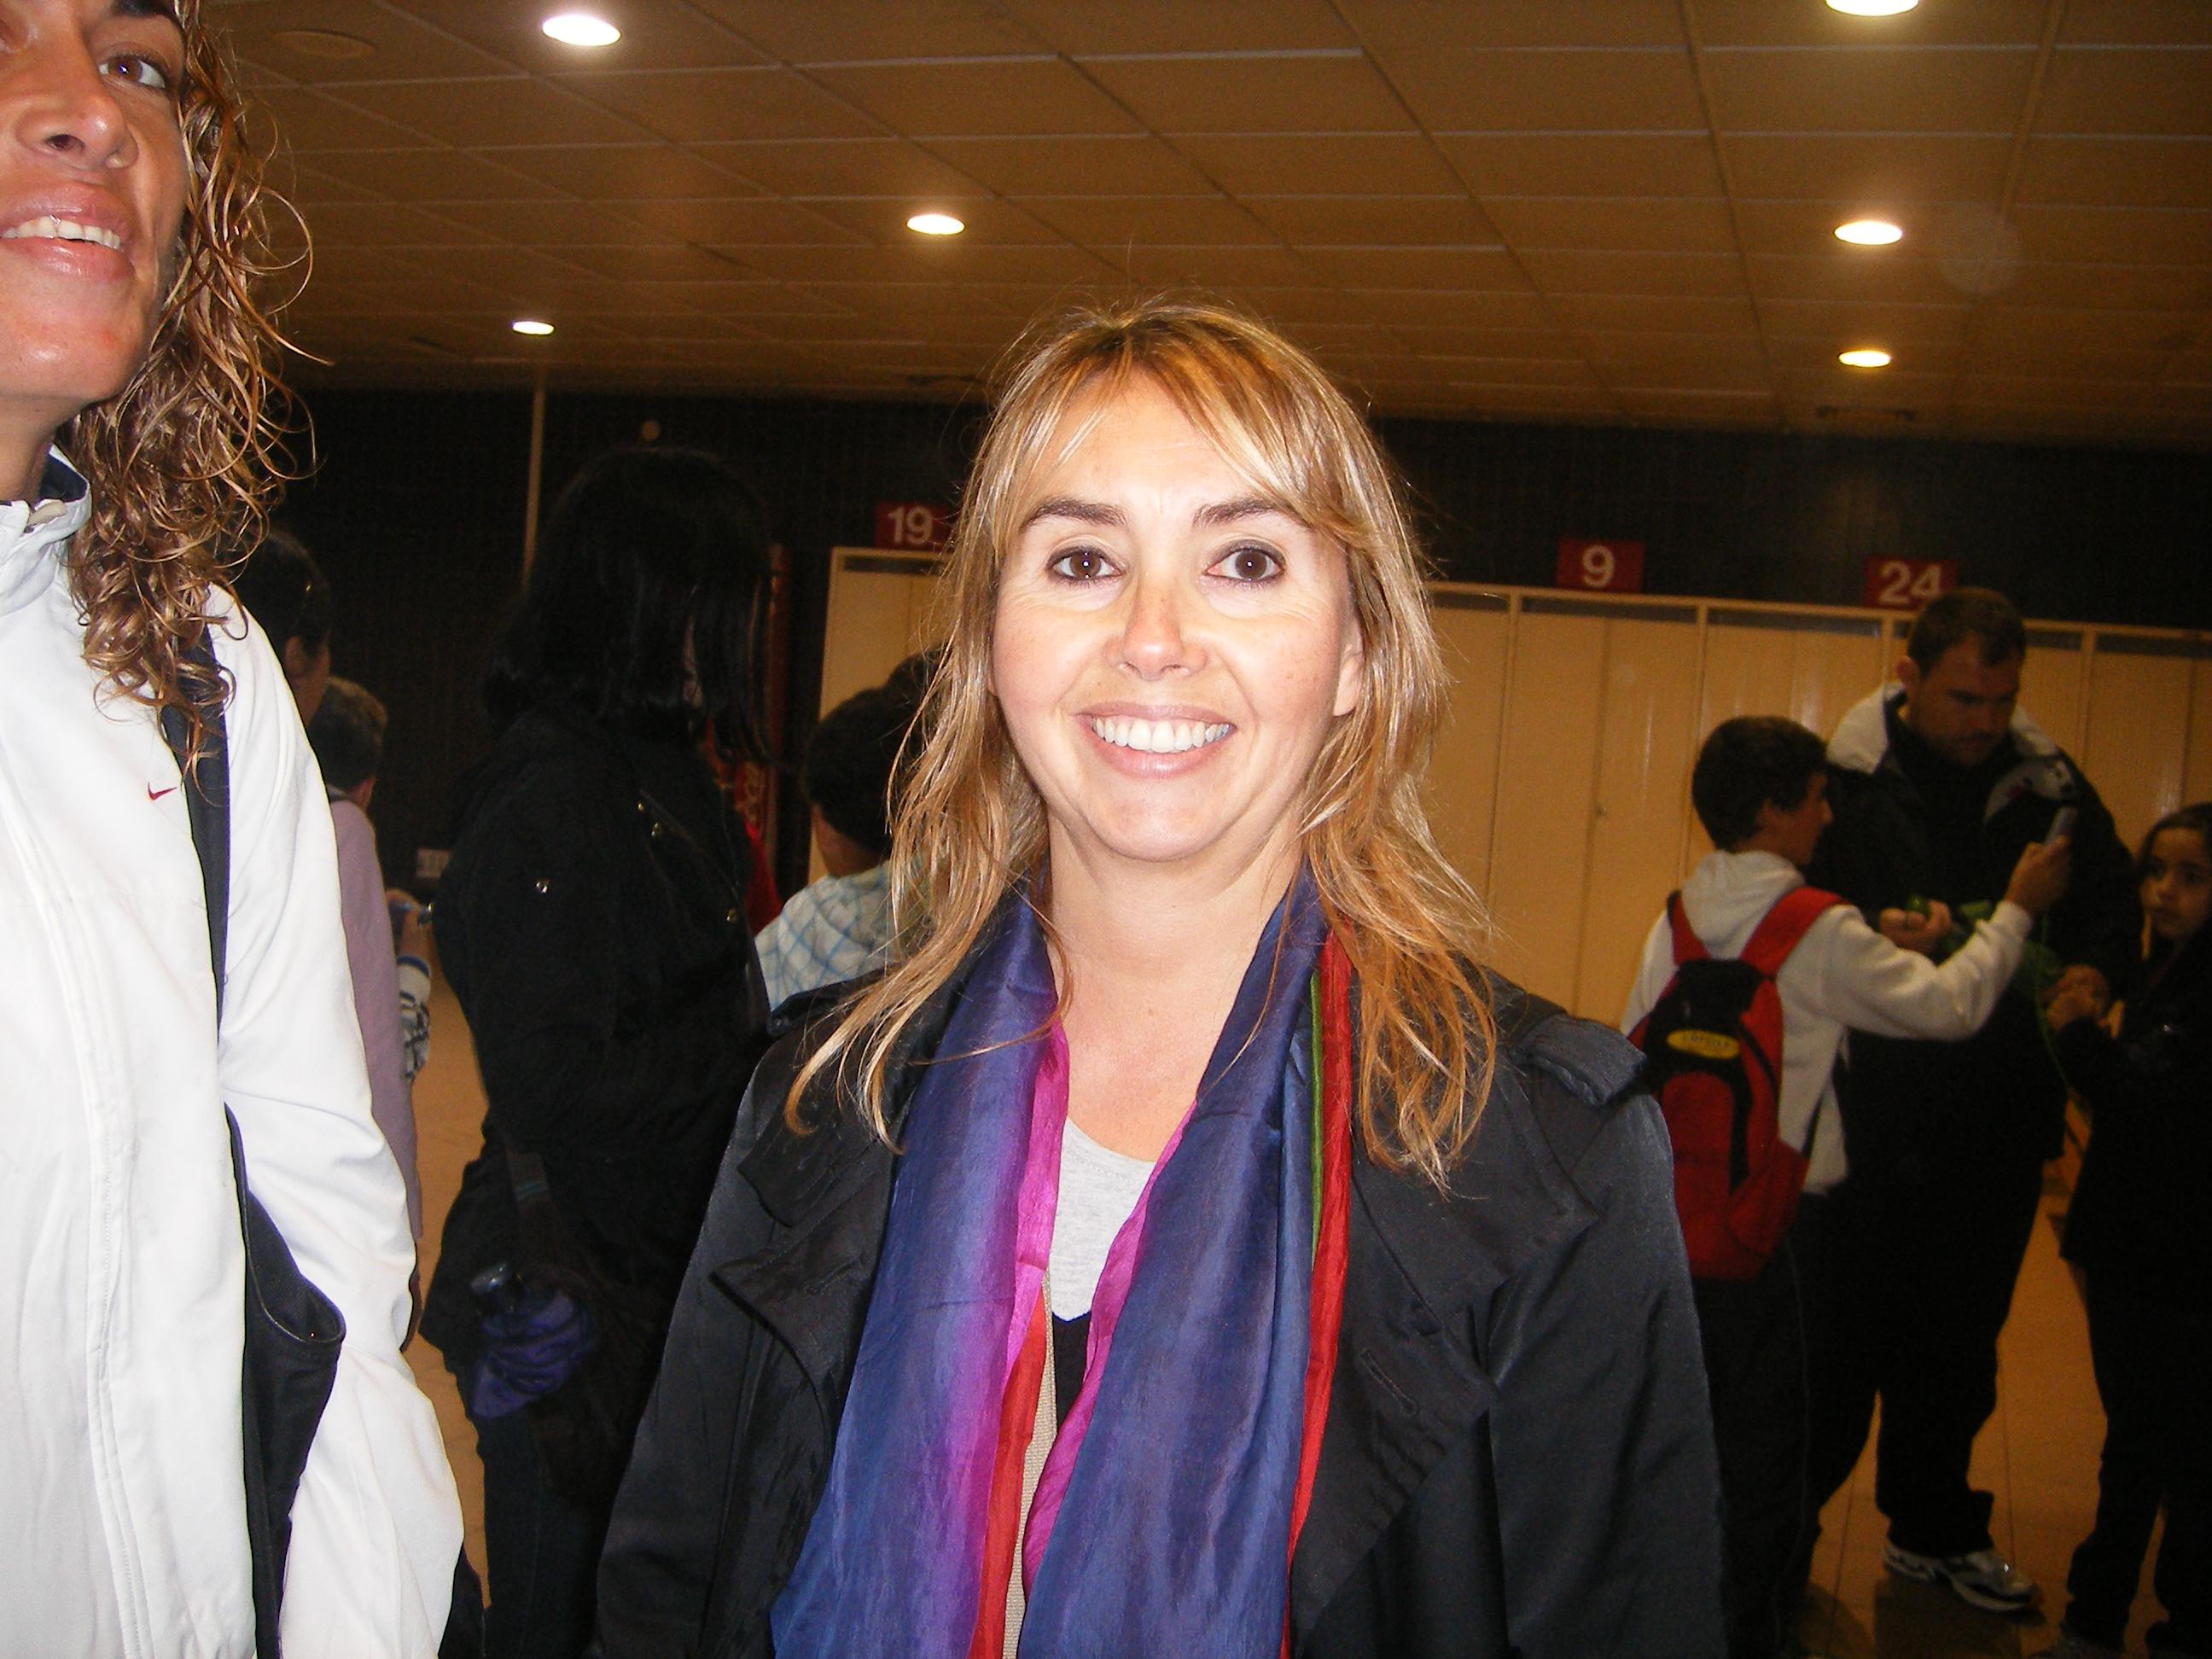 MIREIA CAMPOS SANCHEZ